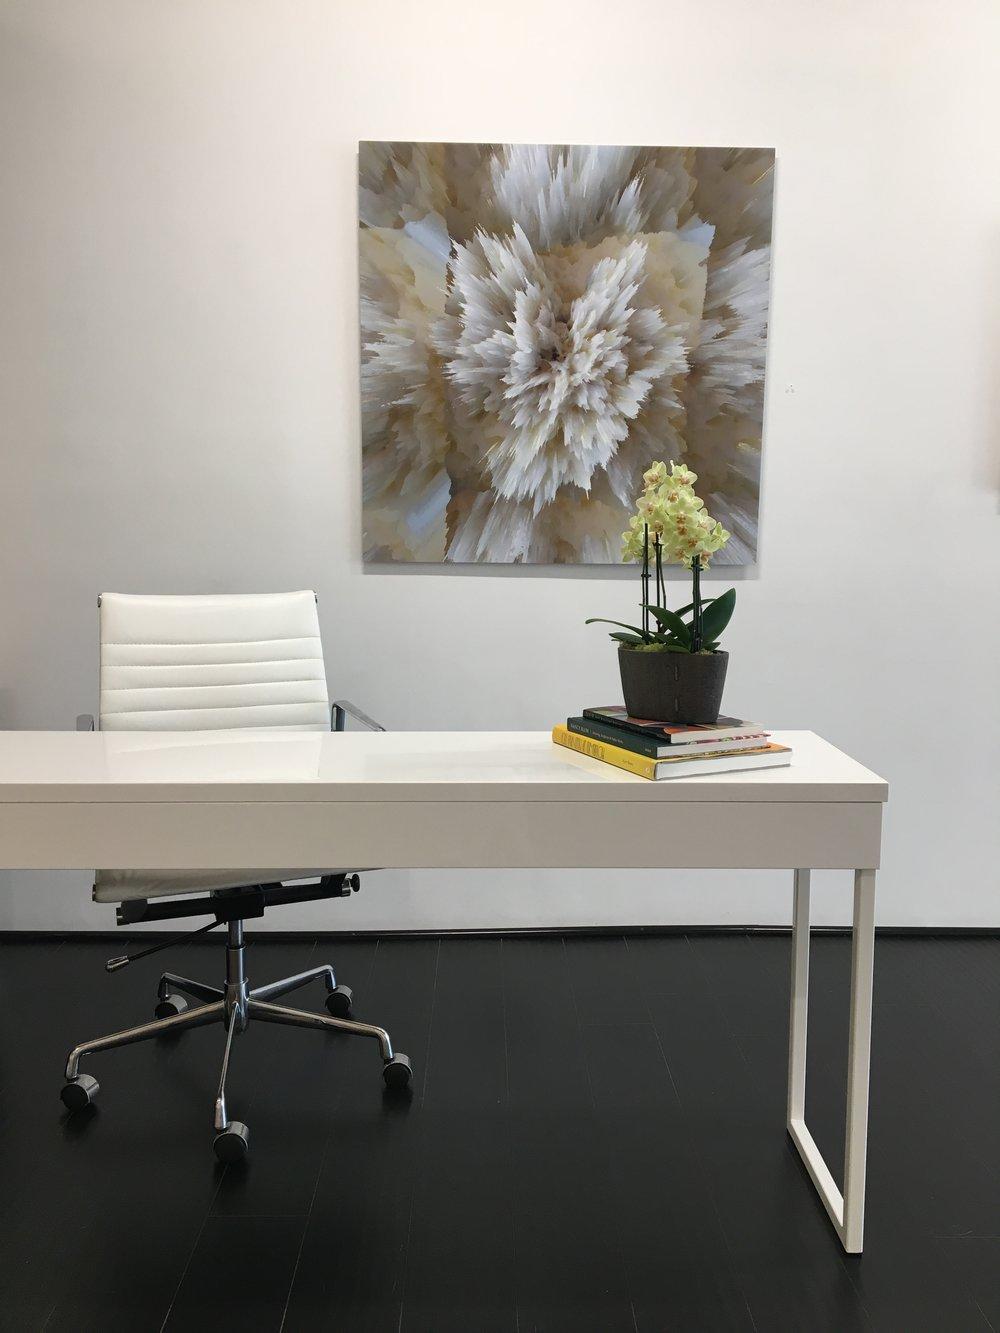 Alex Osborne,  ELECTRIC BURRATA , 2017, dye sublimation print on aluminum, 40 x 40 inches, edition 3/3, $3750. (installation view)